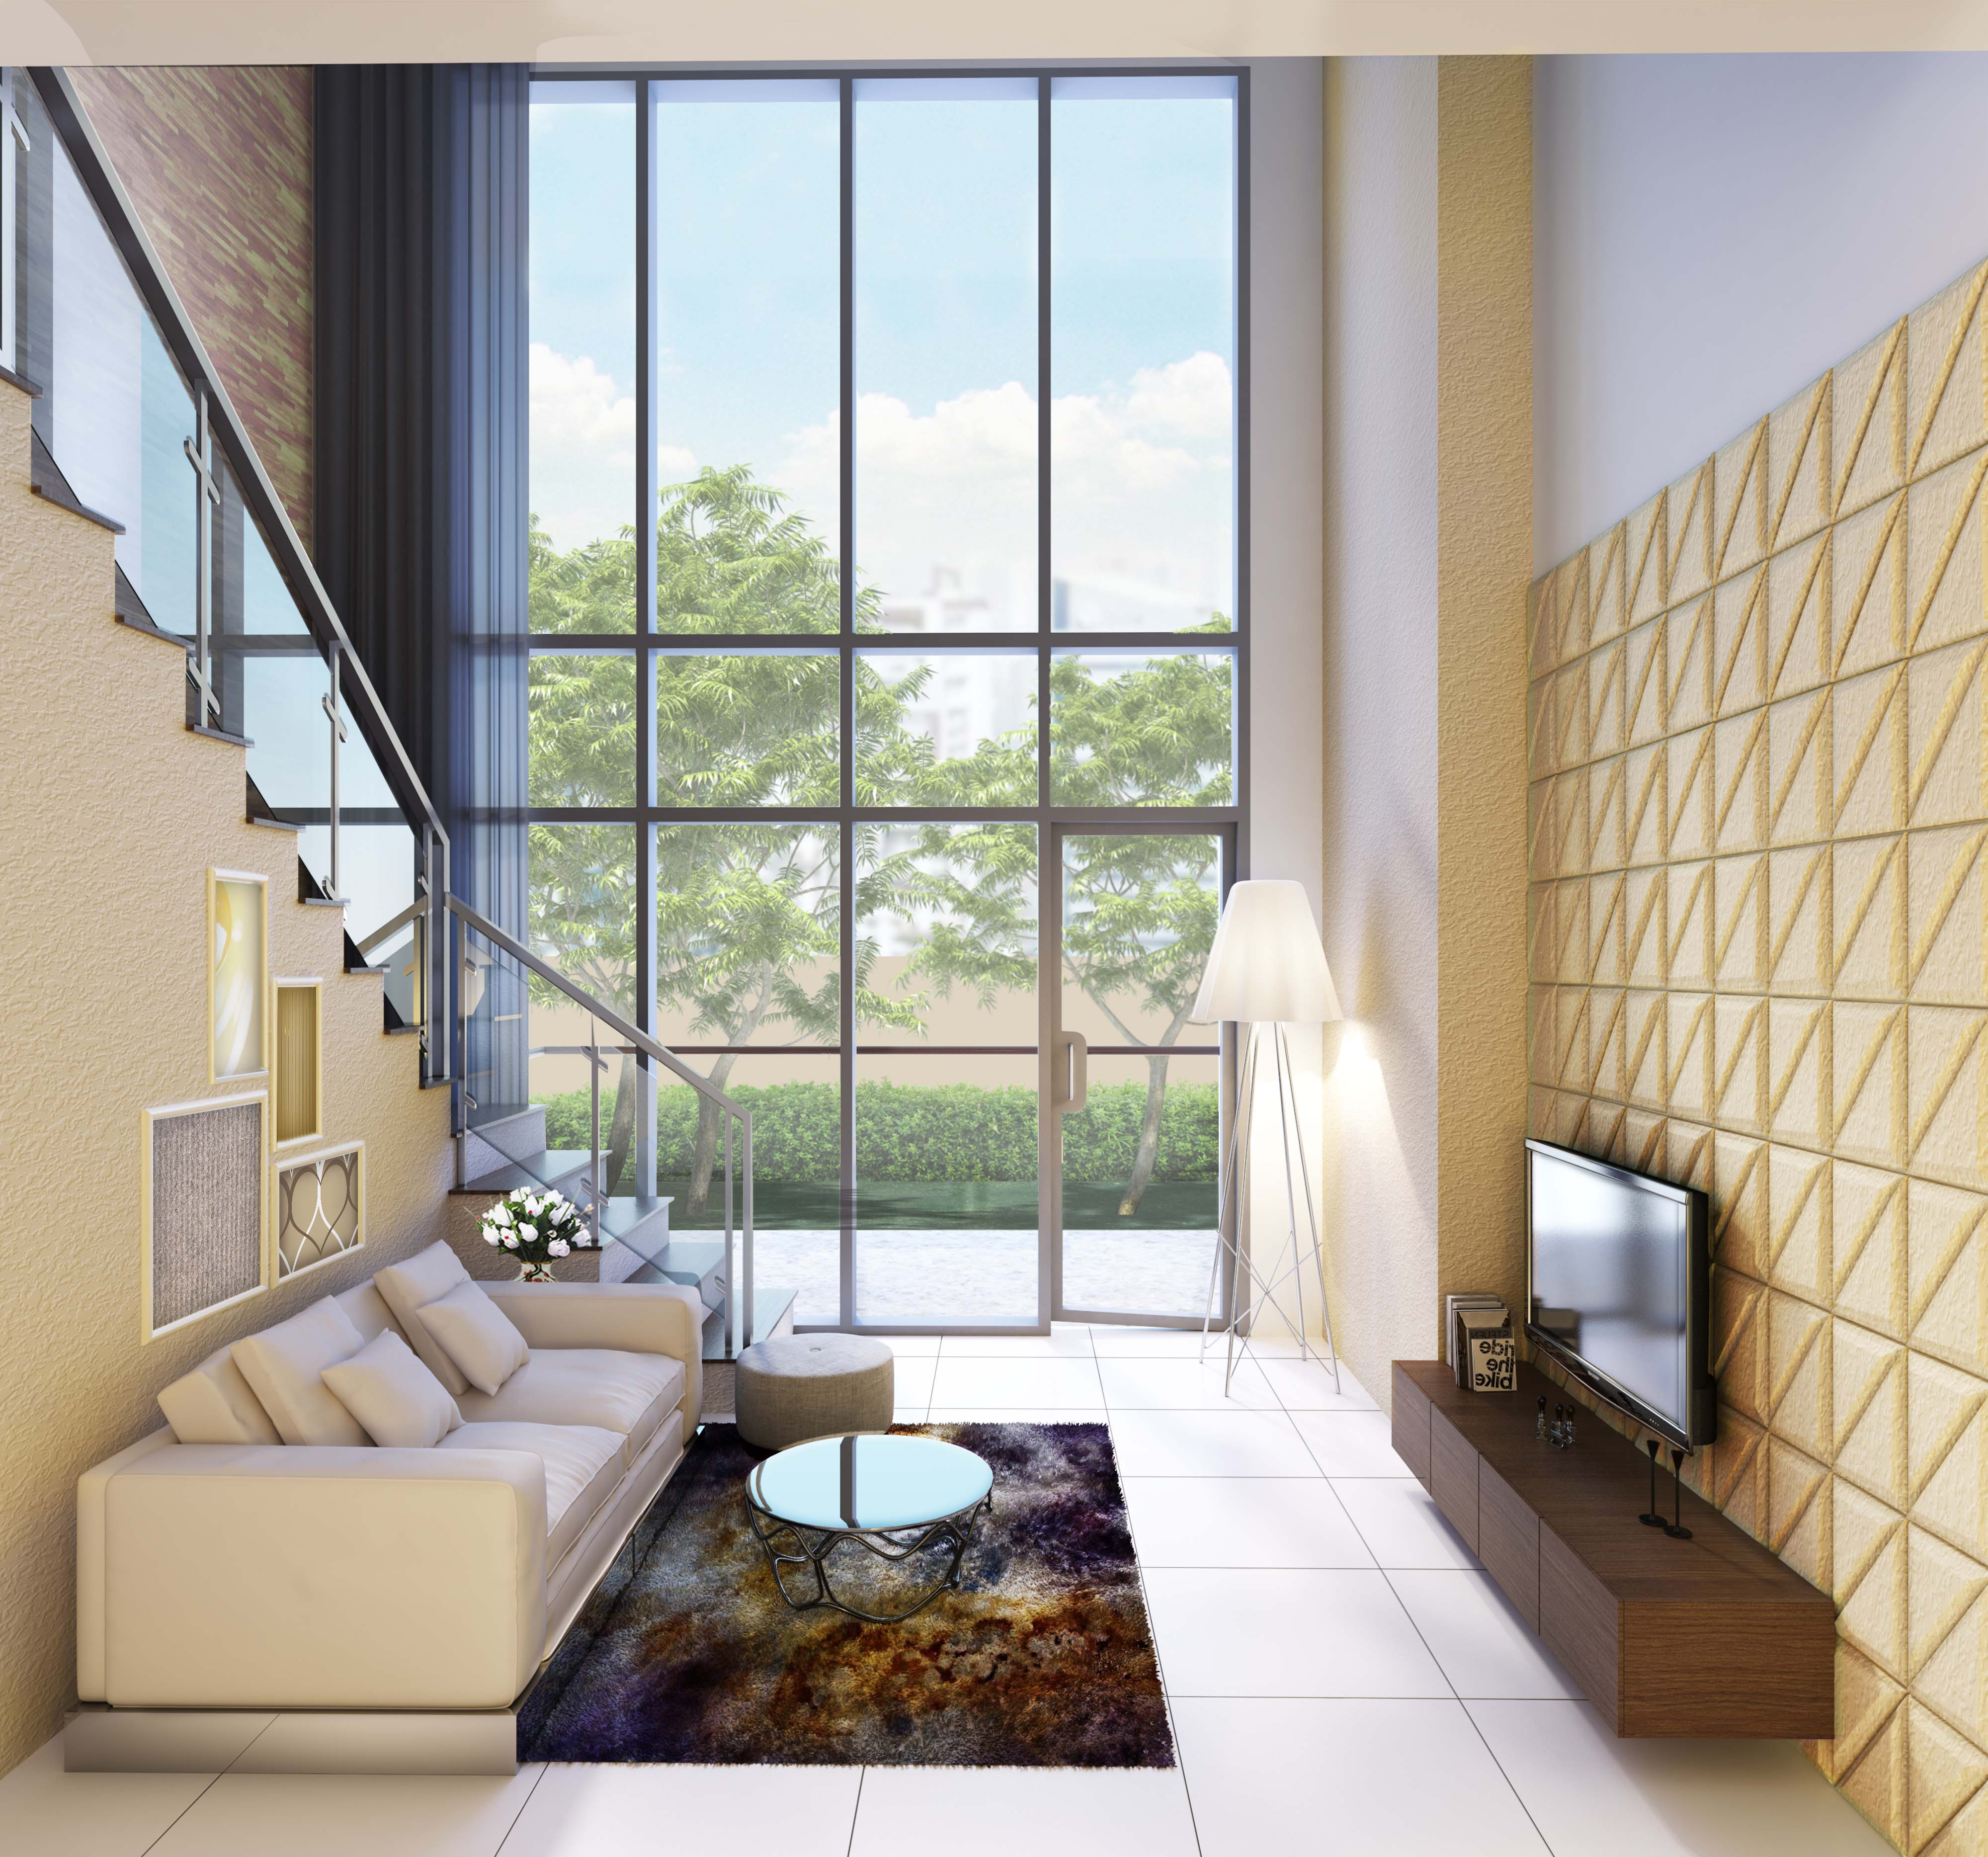 uptown-parksuites-tower-2-bgc-condos-for-sale-1br-loft-living